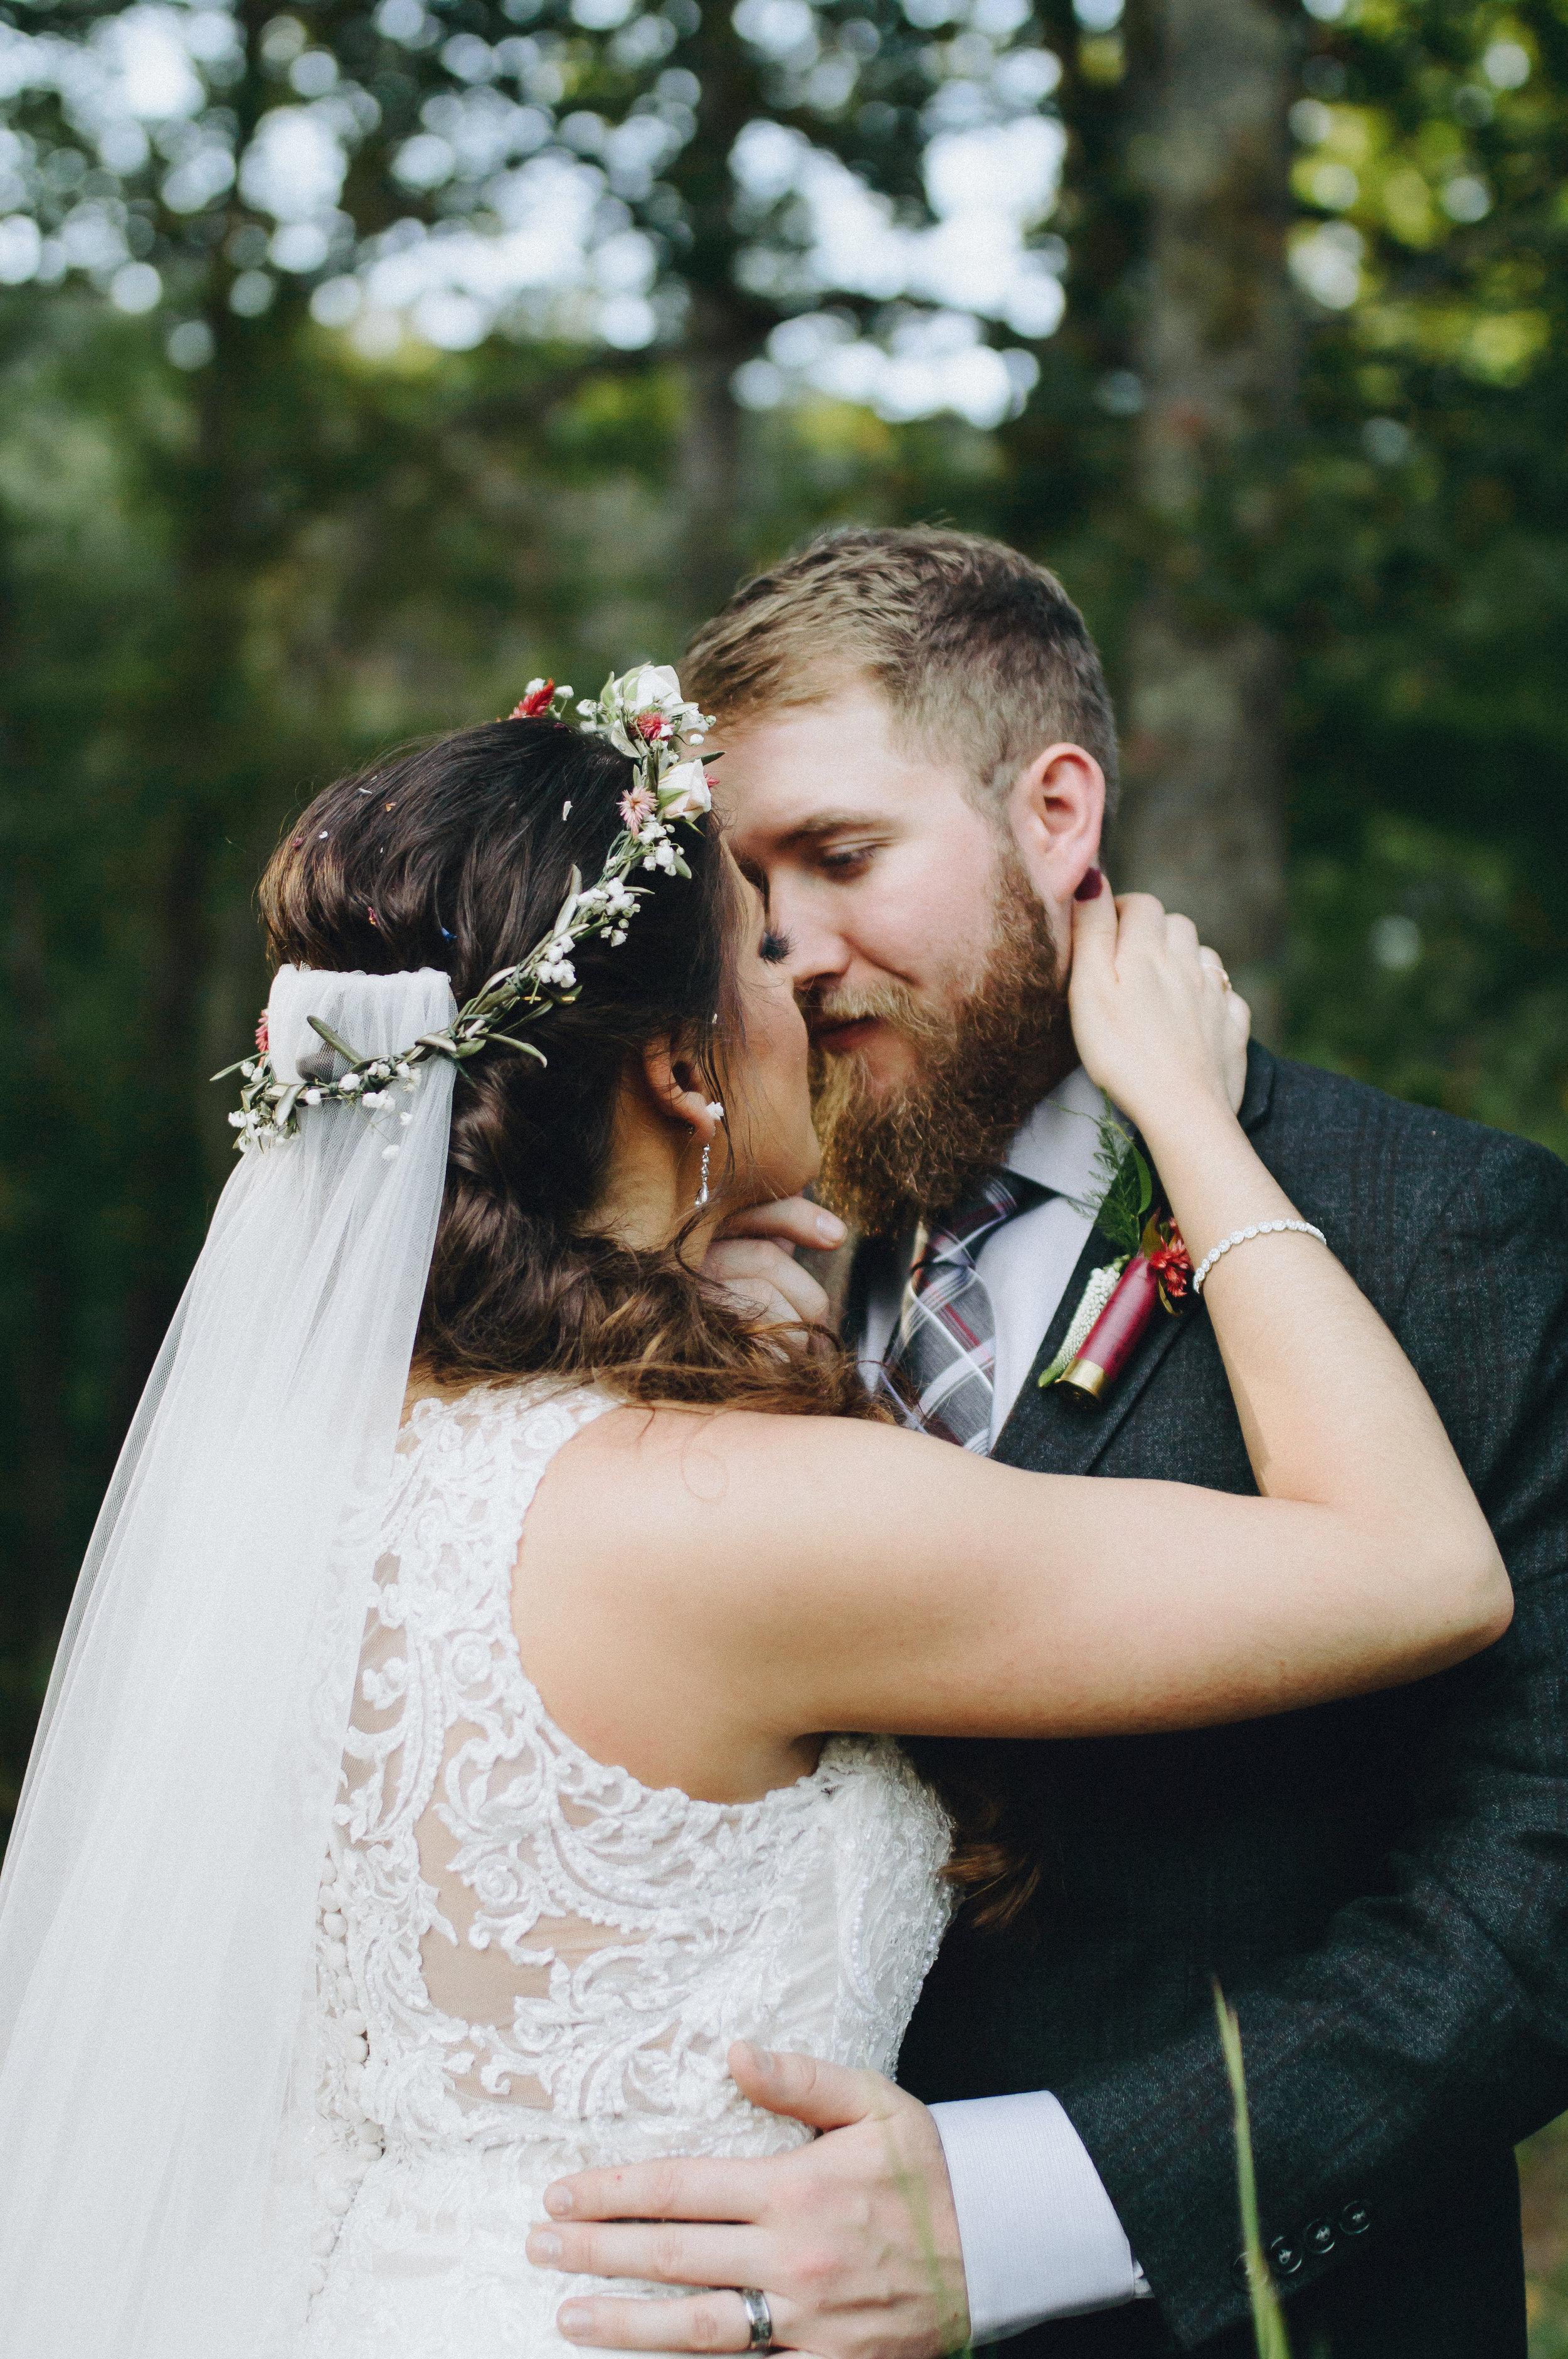 Lauren_Dustin_Wedding - EDITS-20.jpg